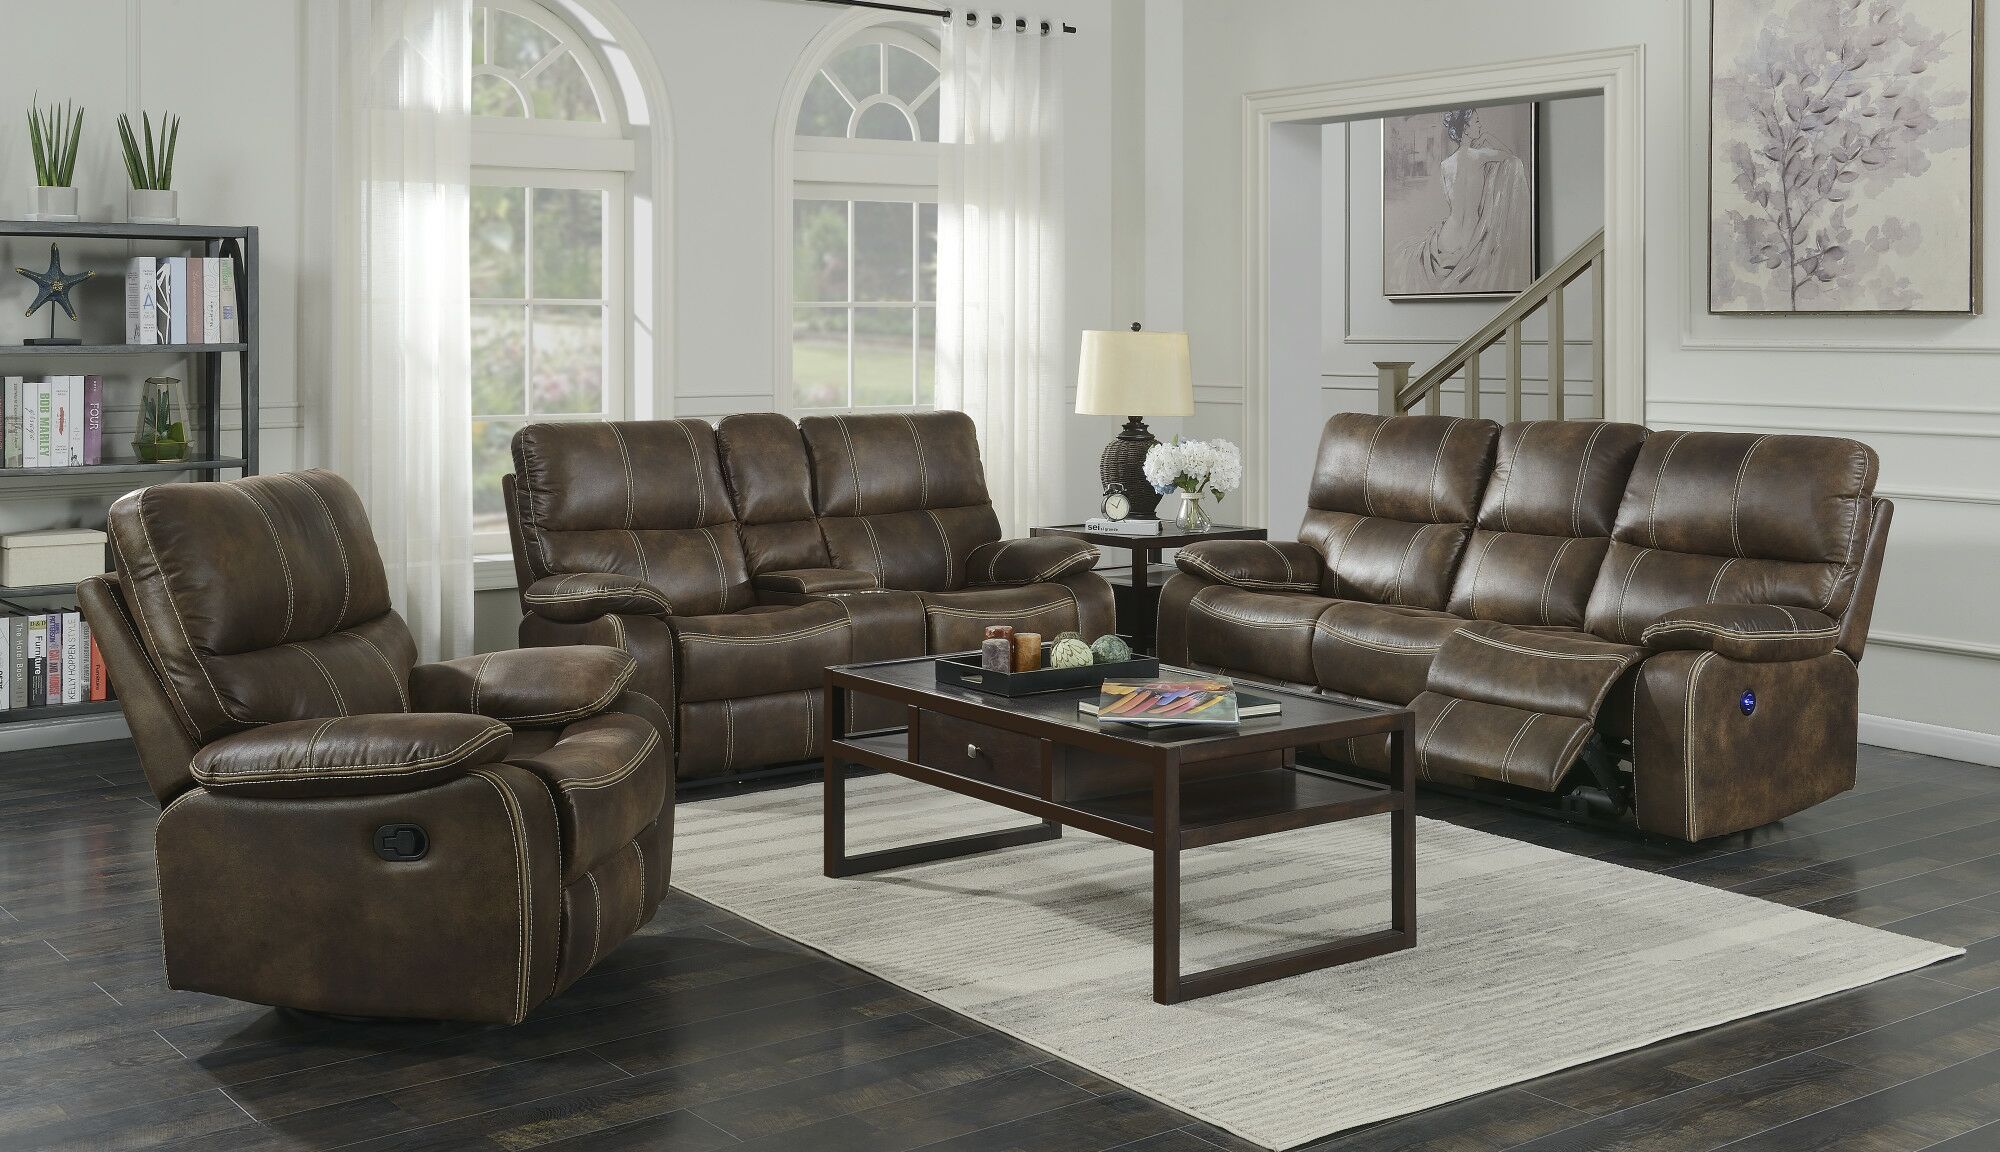 Diorio Reclining Configurable Living Room Set